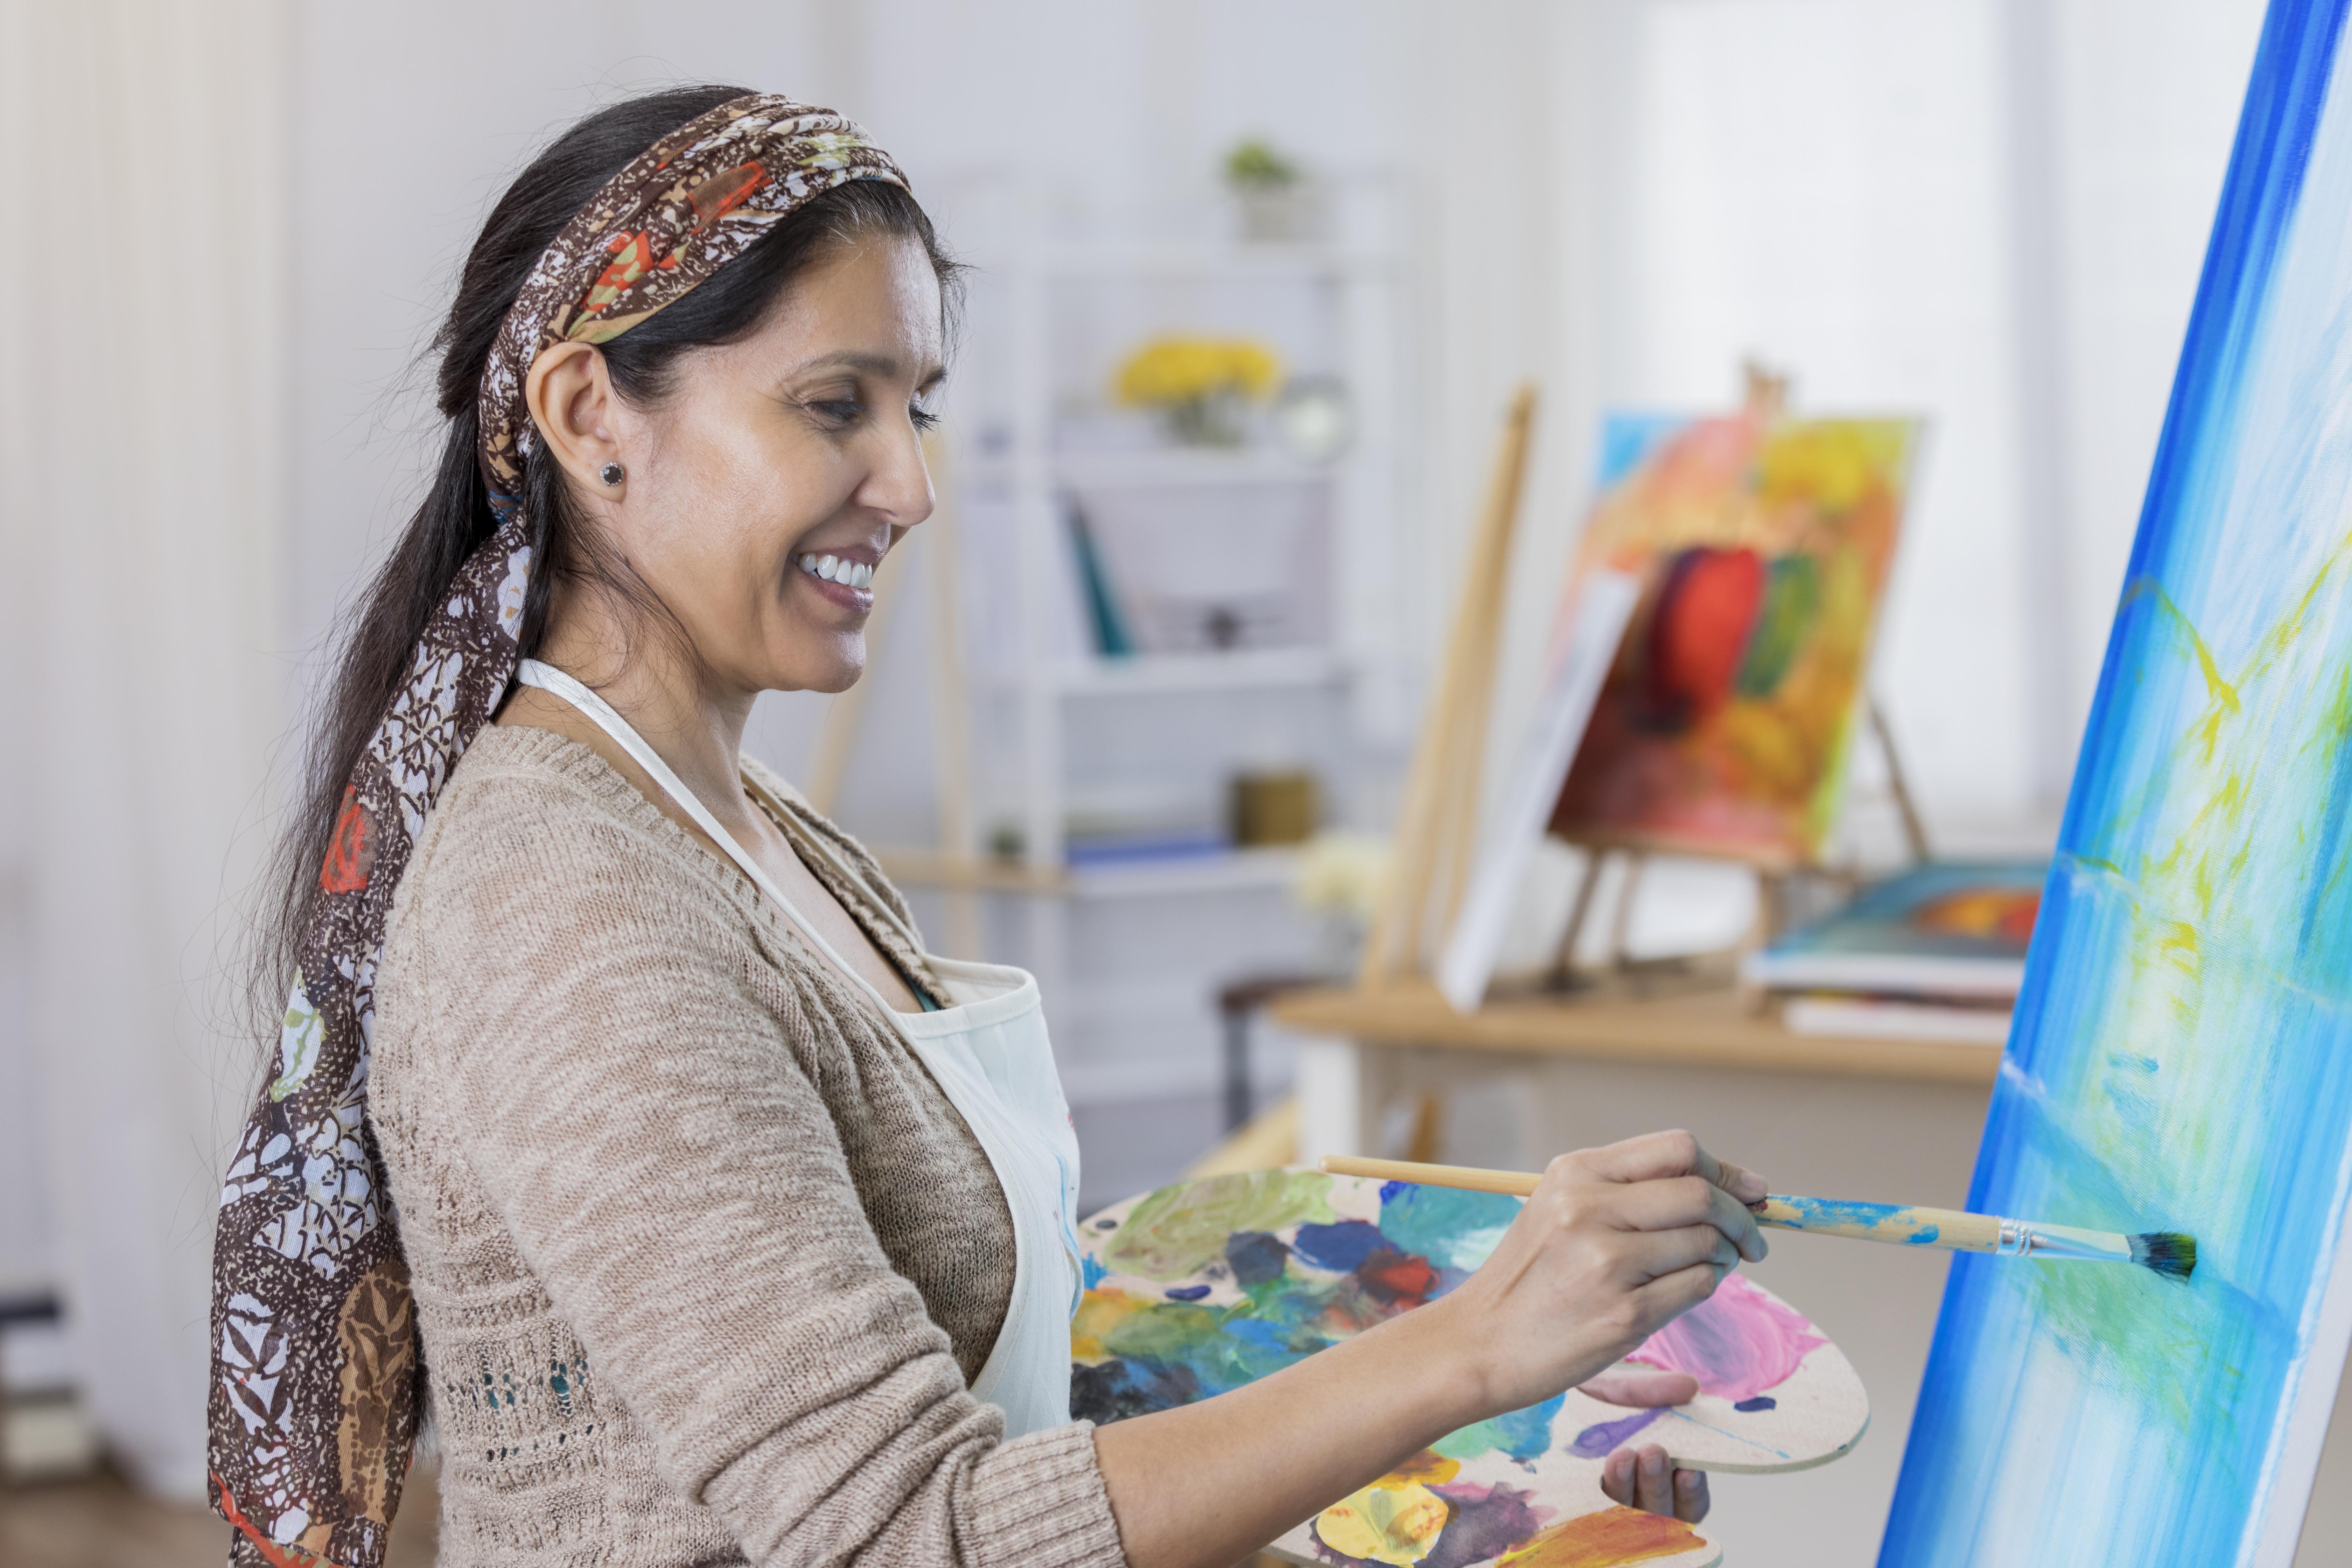 Beautiful woman paints in her art studio